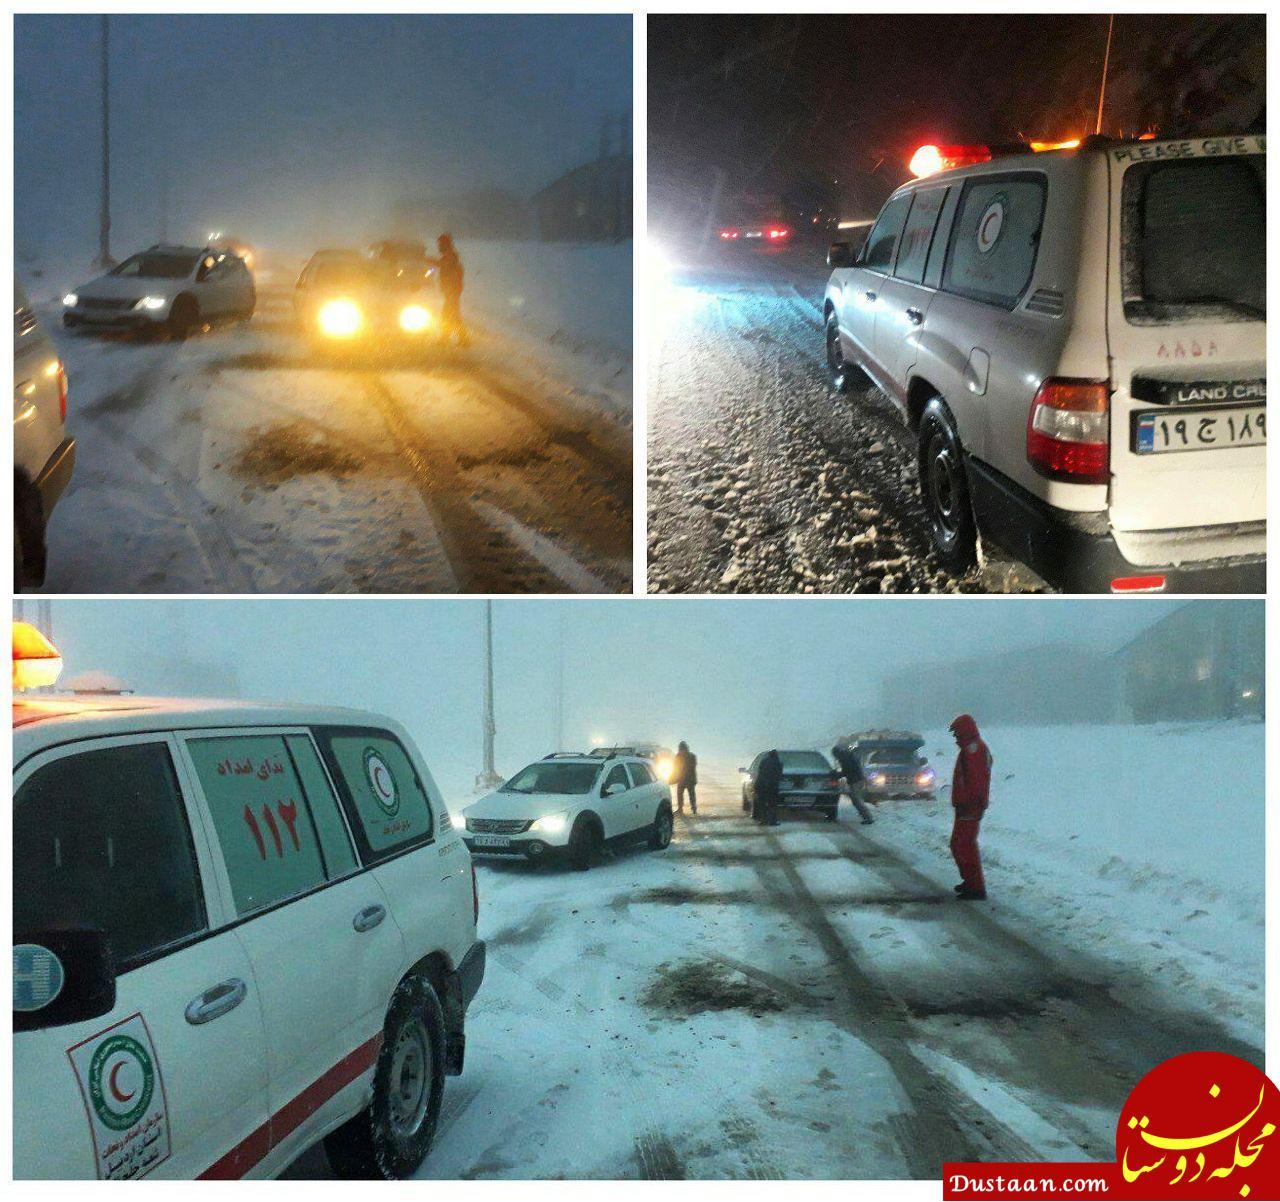 www.dustaan.com بارندگی در جاده های 6 استان /پنجشنبه 17 آبان